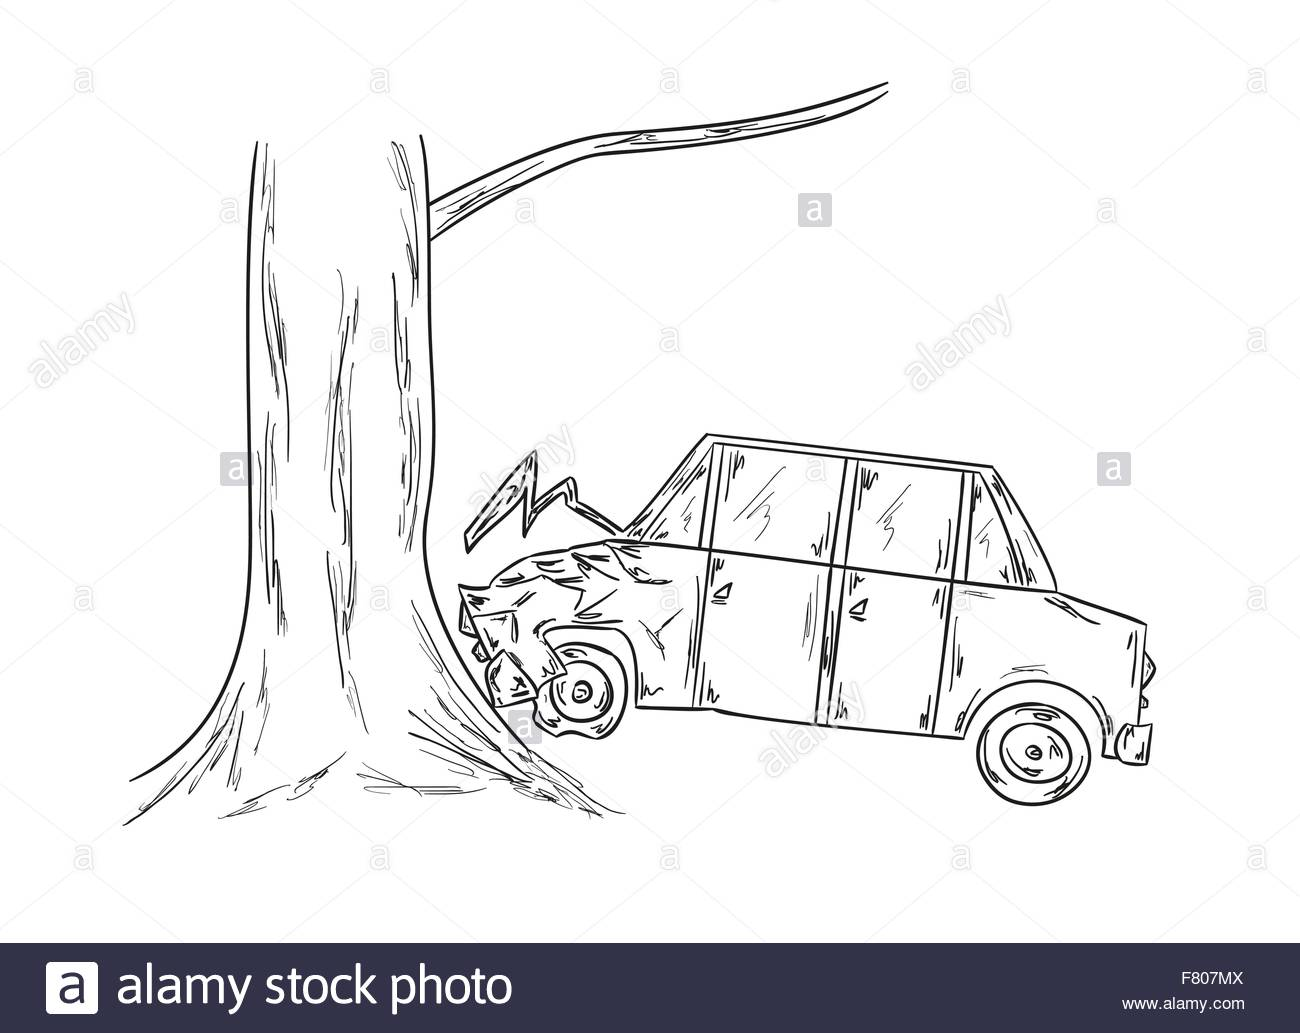 1300x1033 Car Accident Sketch Stock Vector Art Amp Illustration, Vector Image